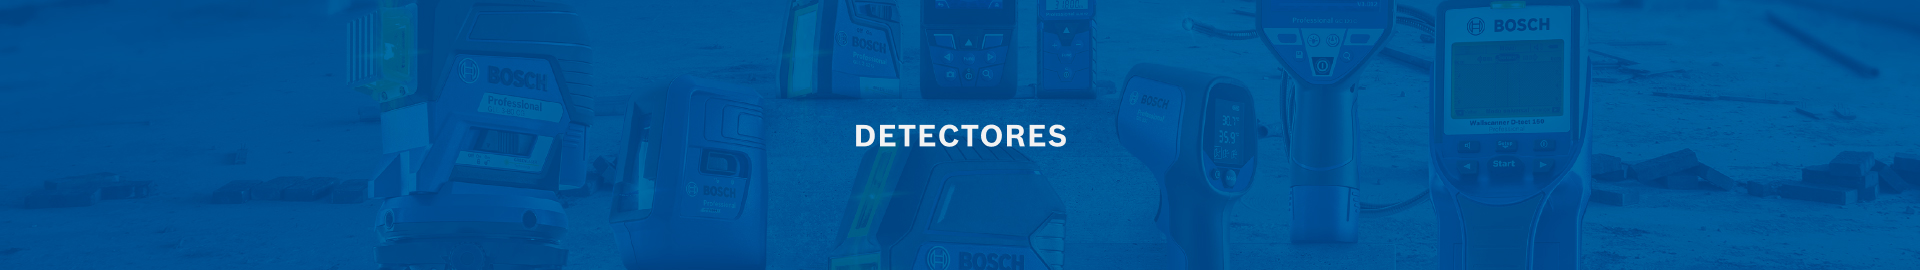 Detectores